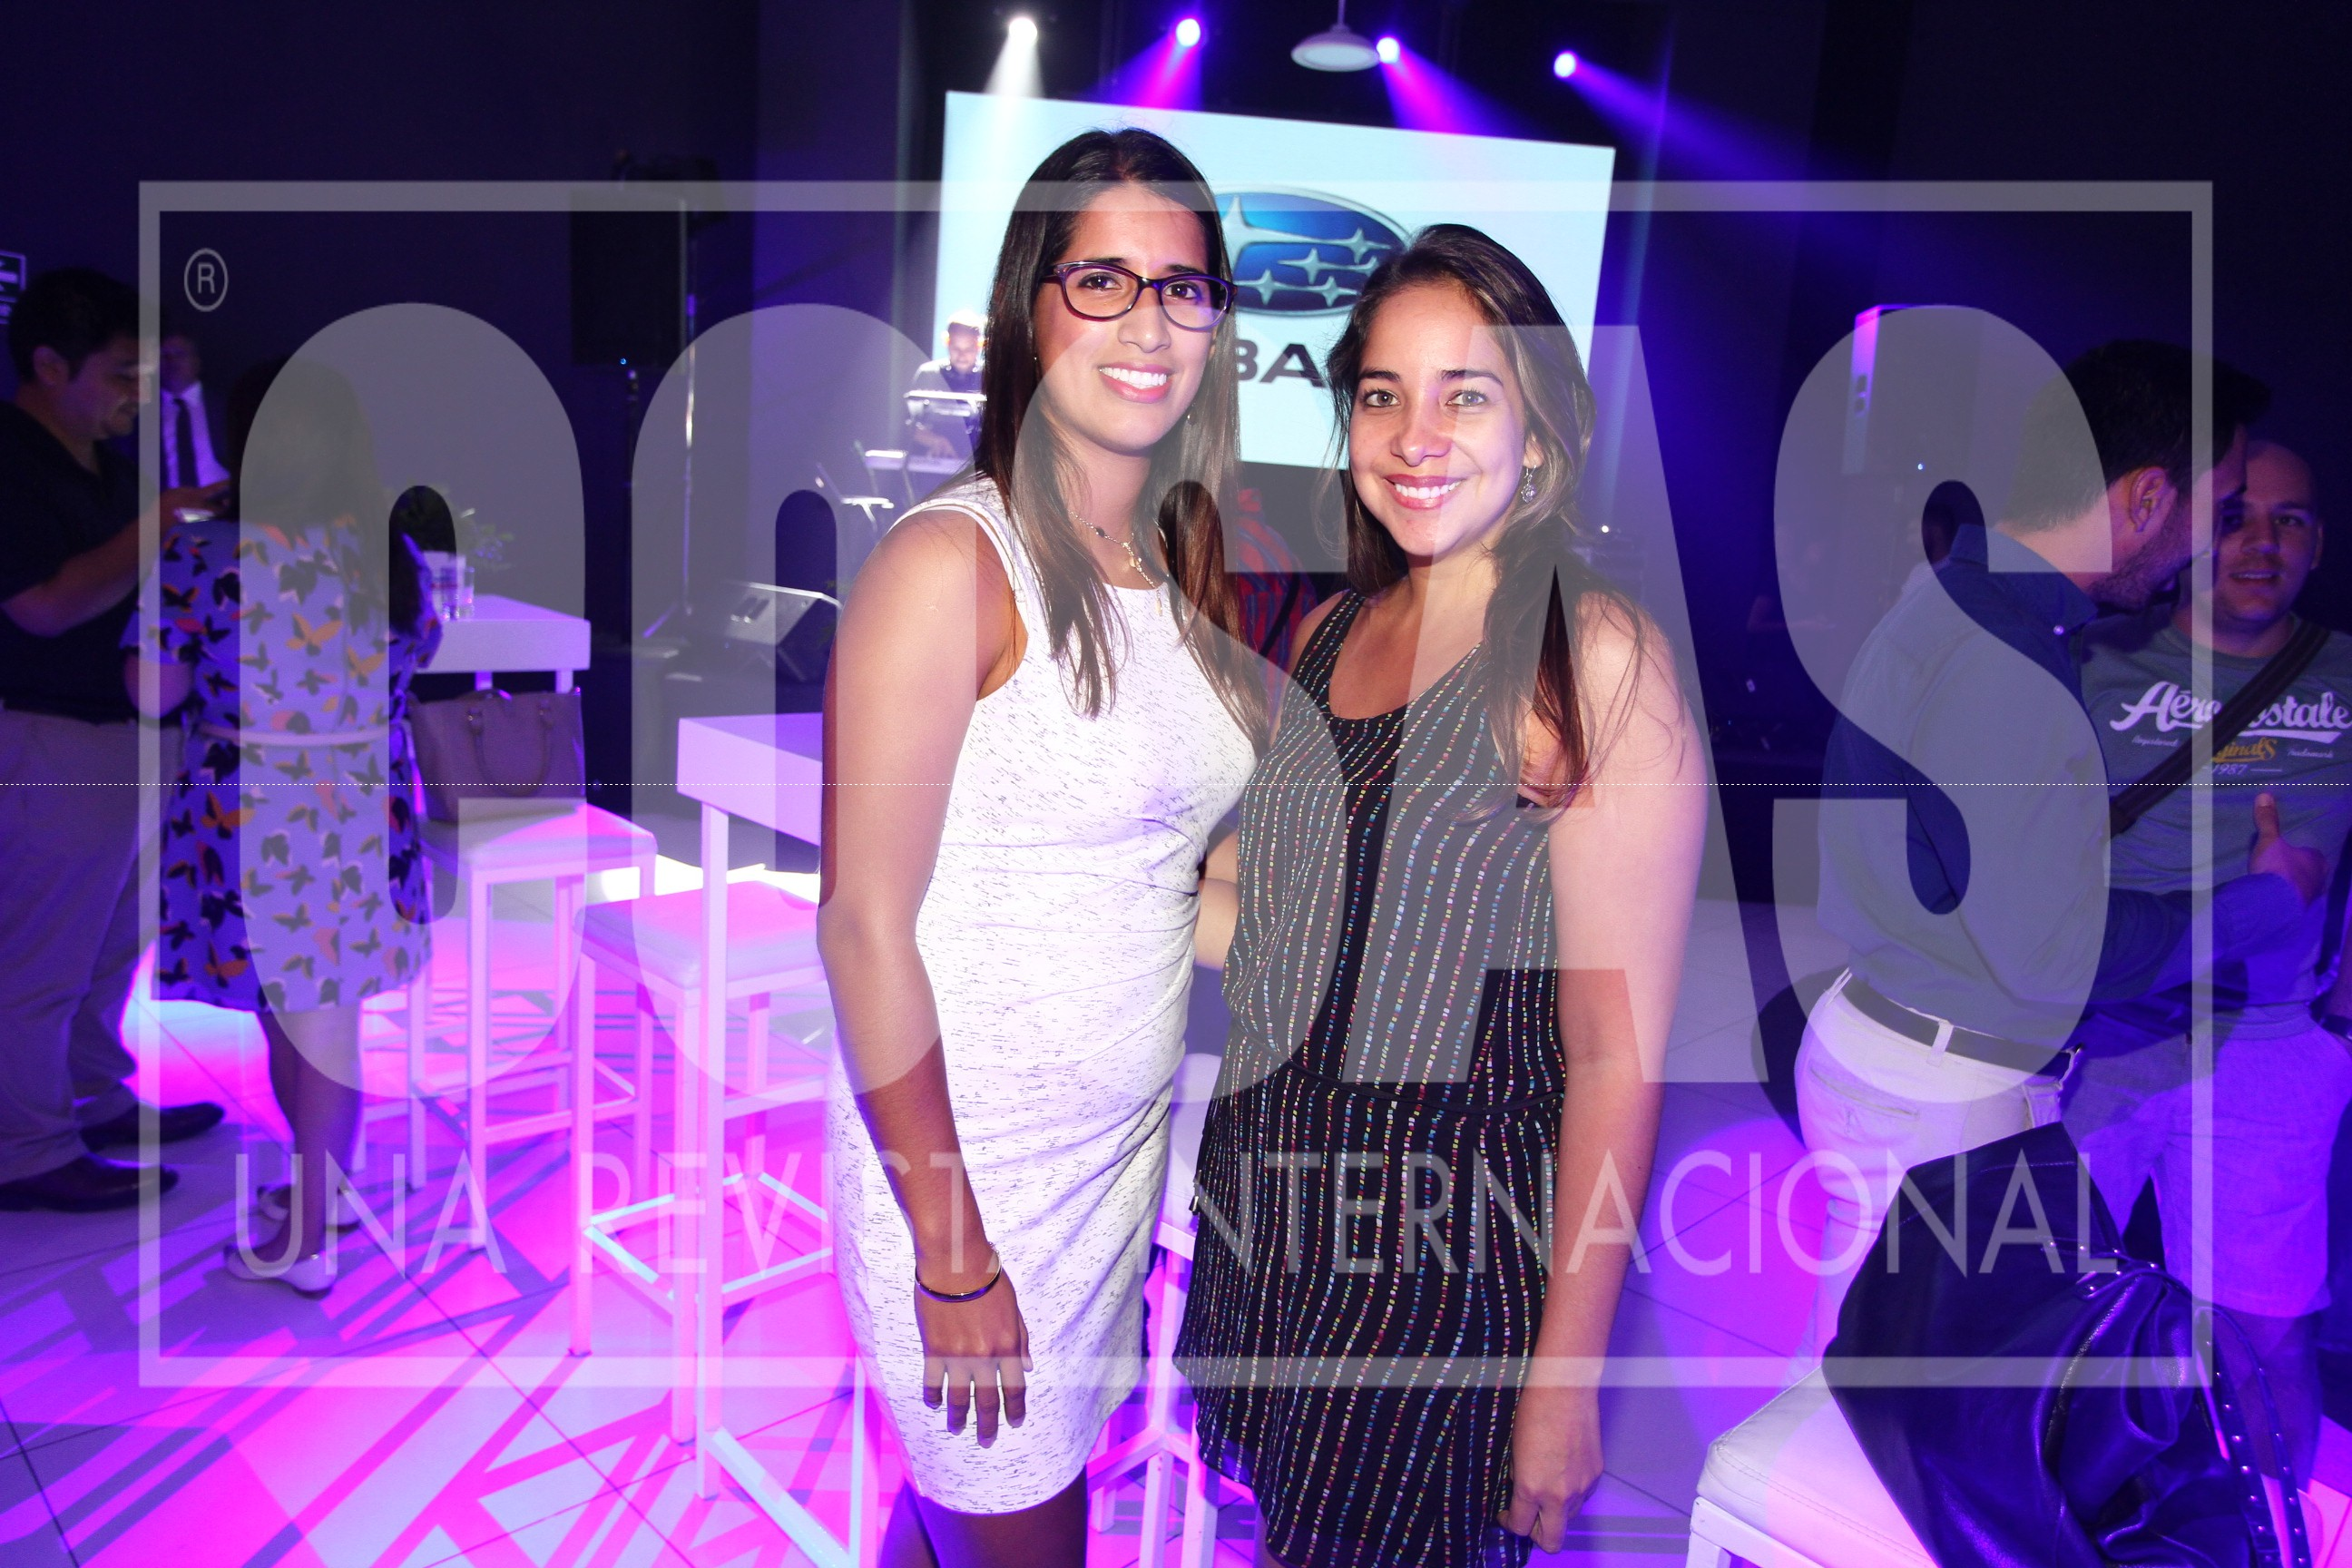 Claudia Sanchez y Ursula Wisse.